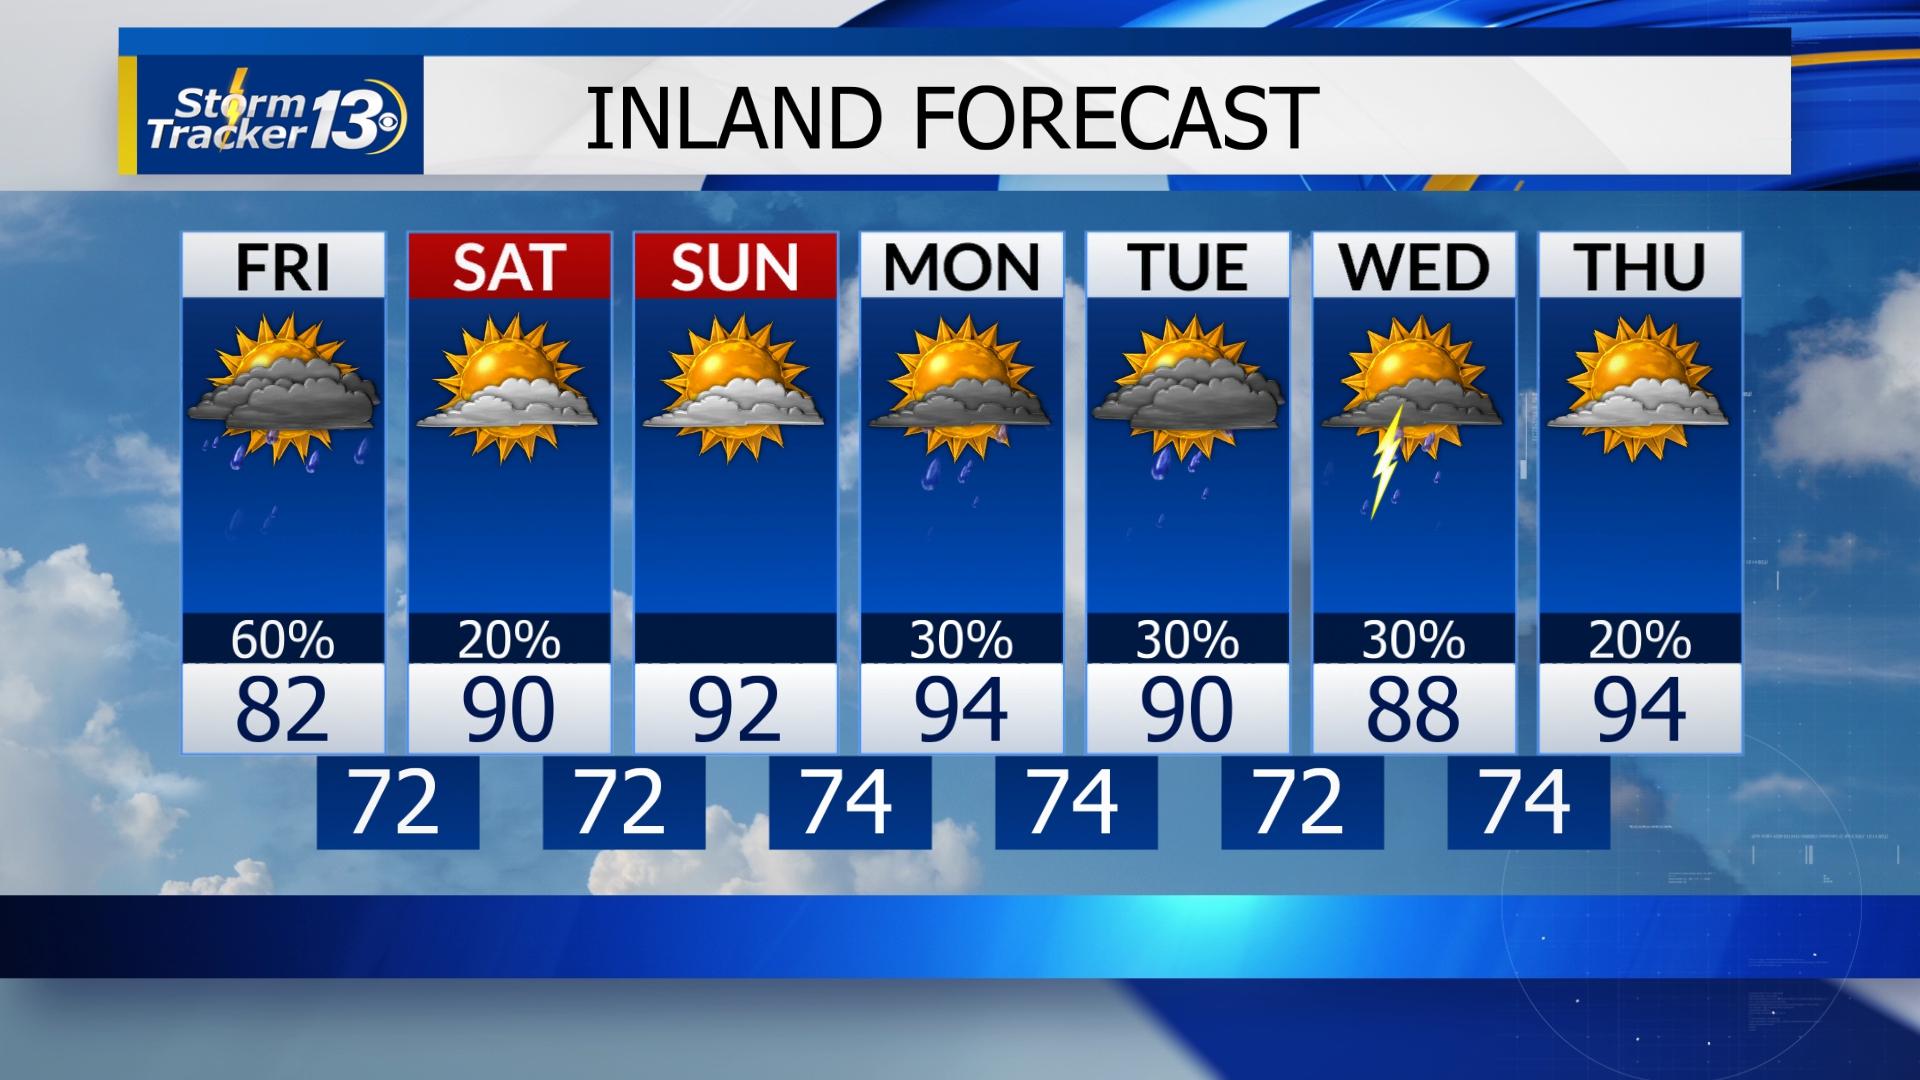 Inland Forecast